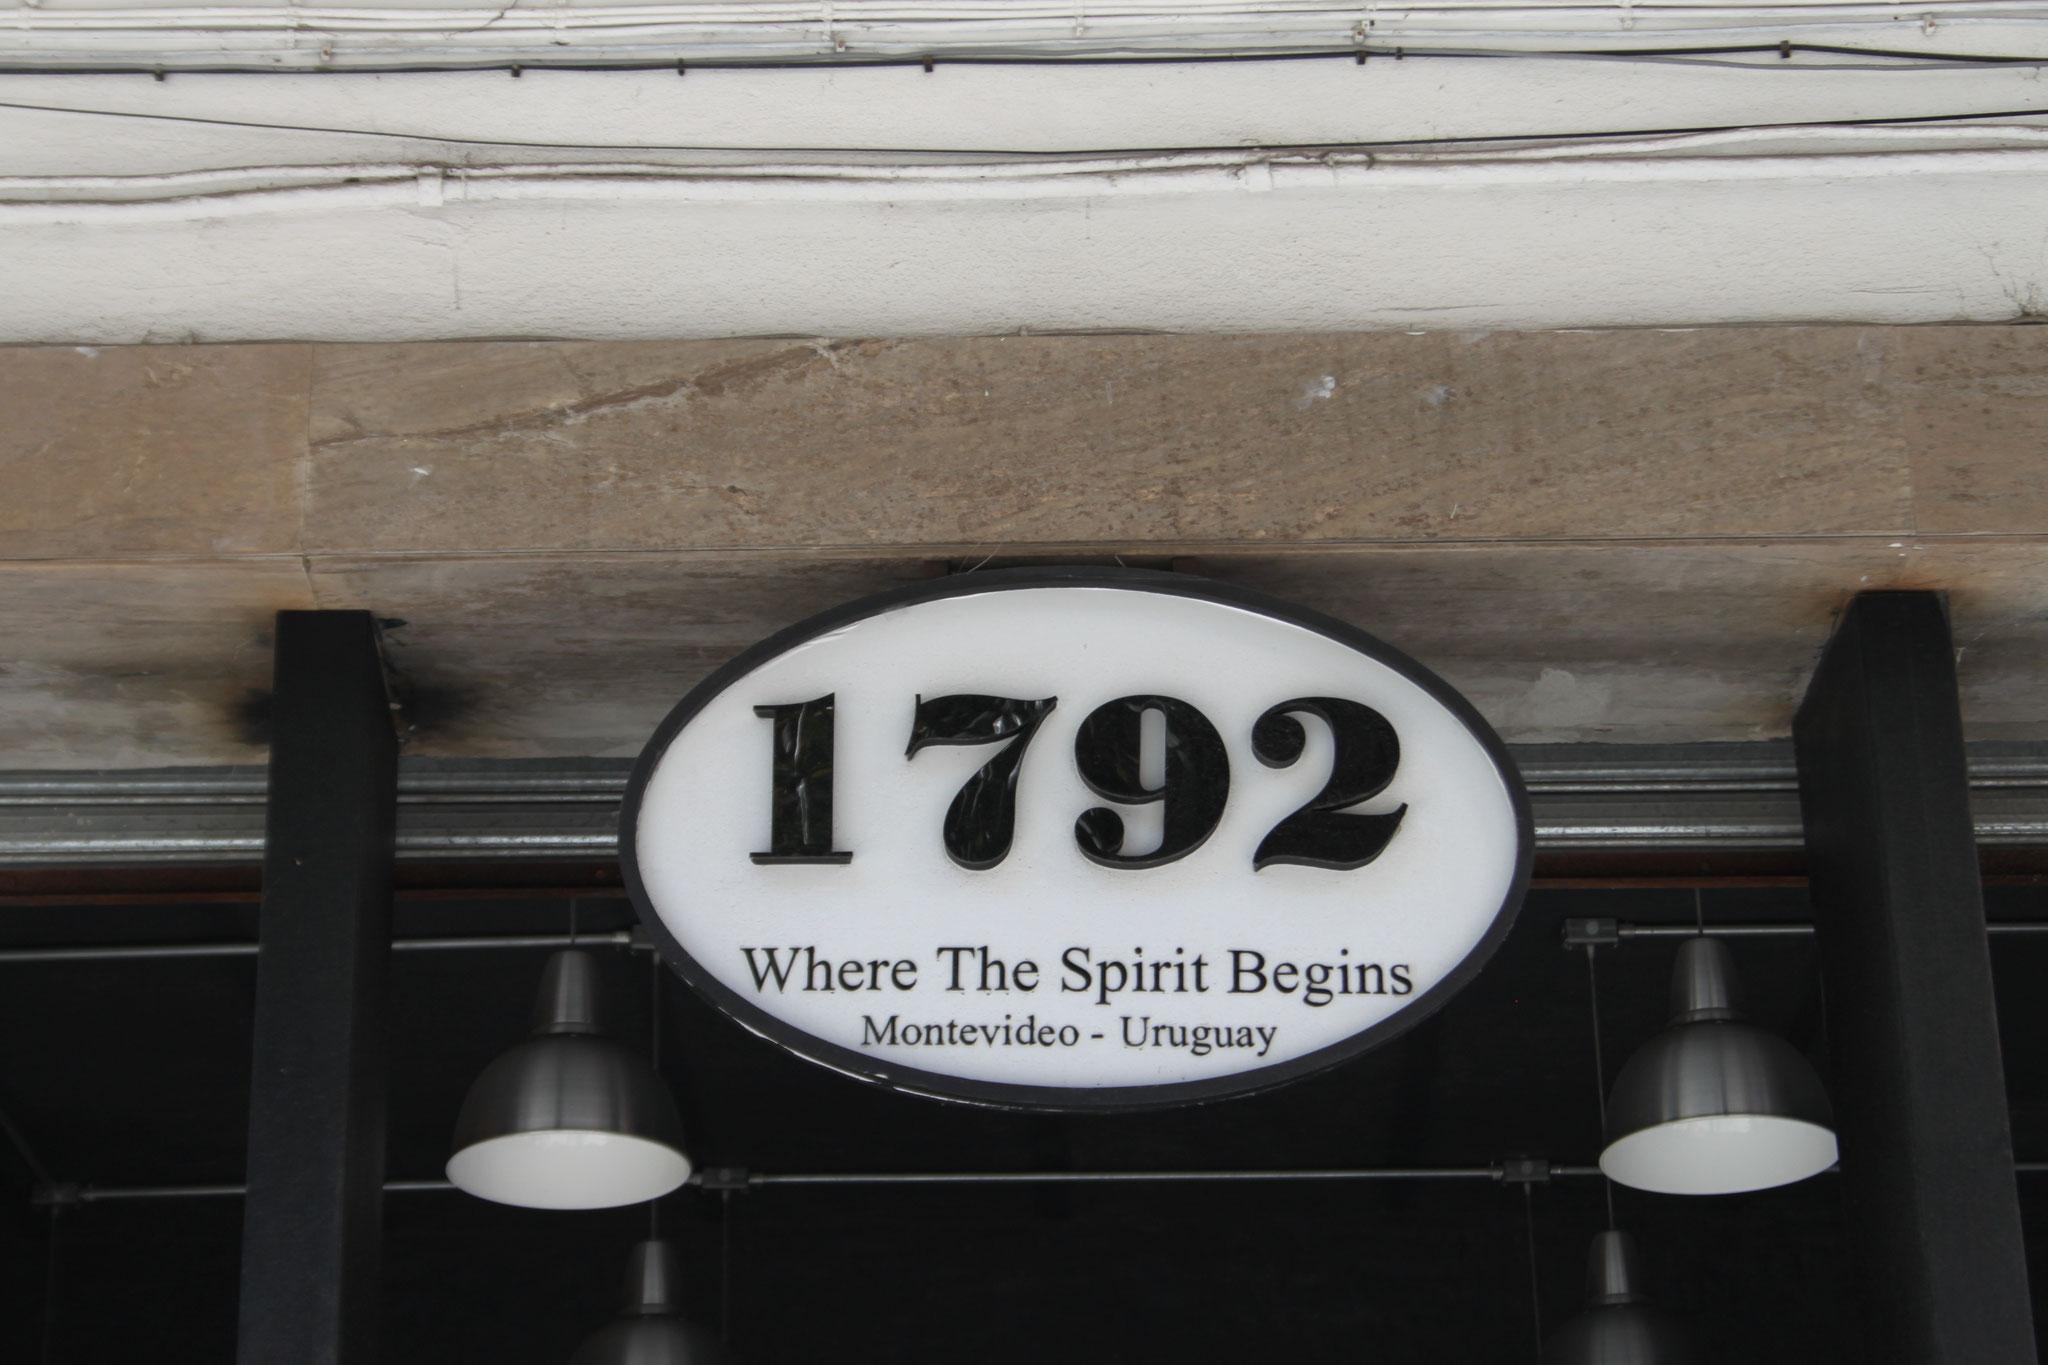 Hausnummer in der Altstadt von Montevideo